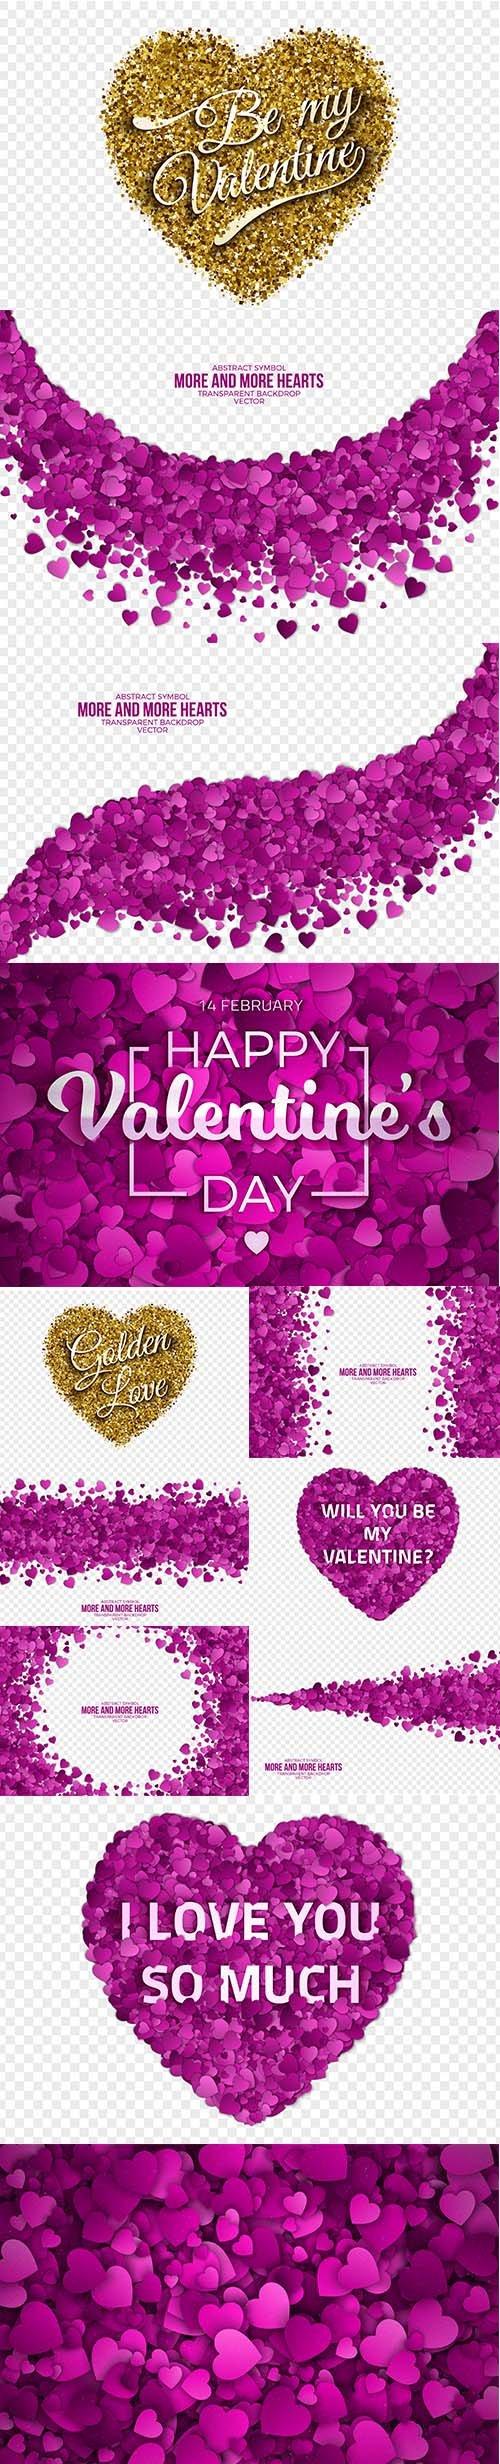 Set of Romantic Valentines Day Illustrations Vol 3